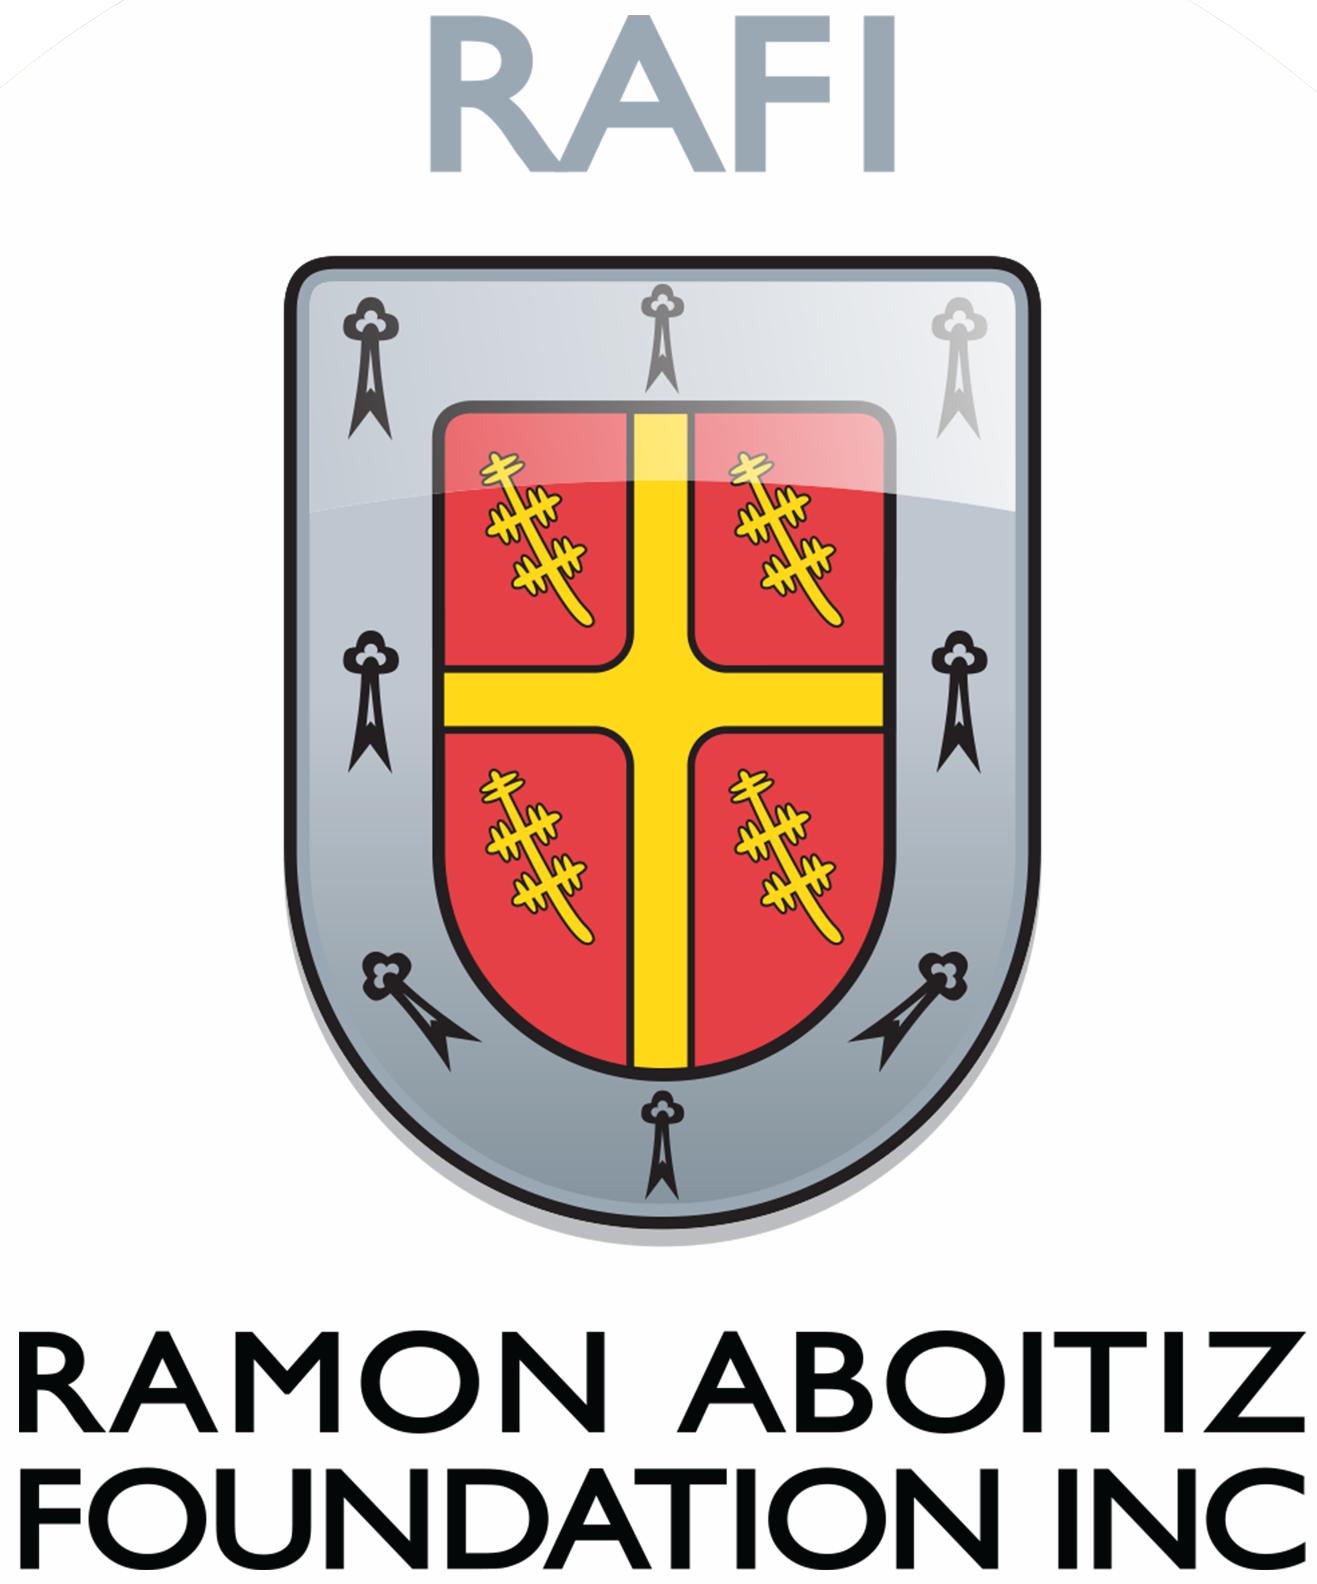 Ramon Aboitiz Foundation, Inc.